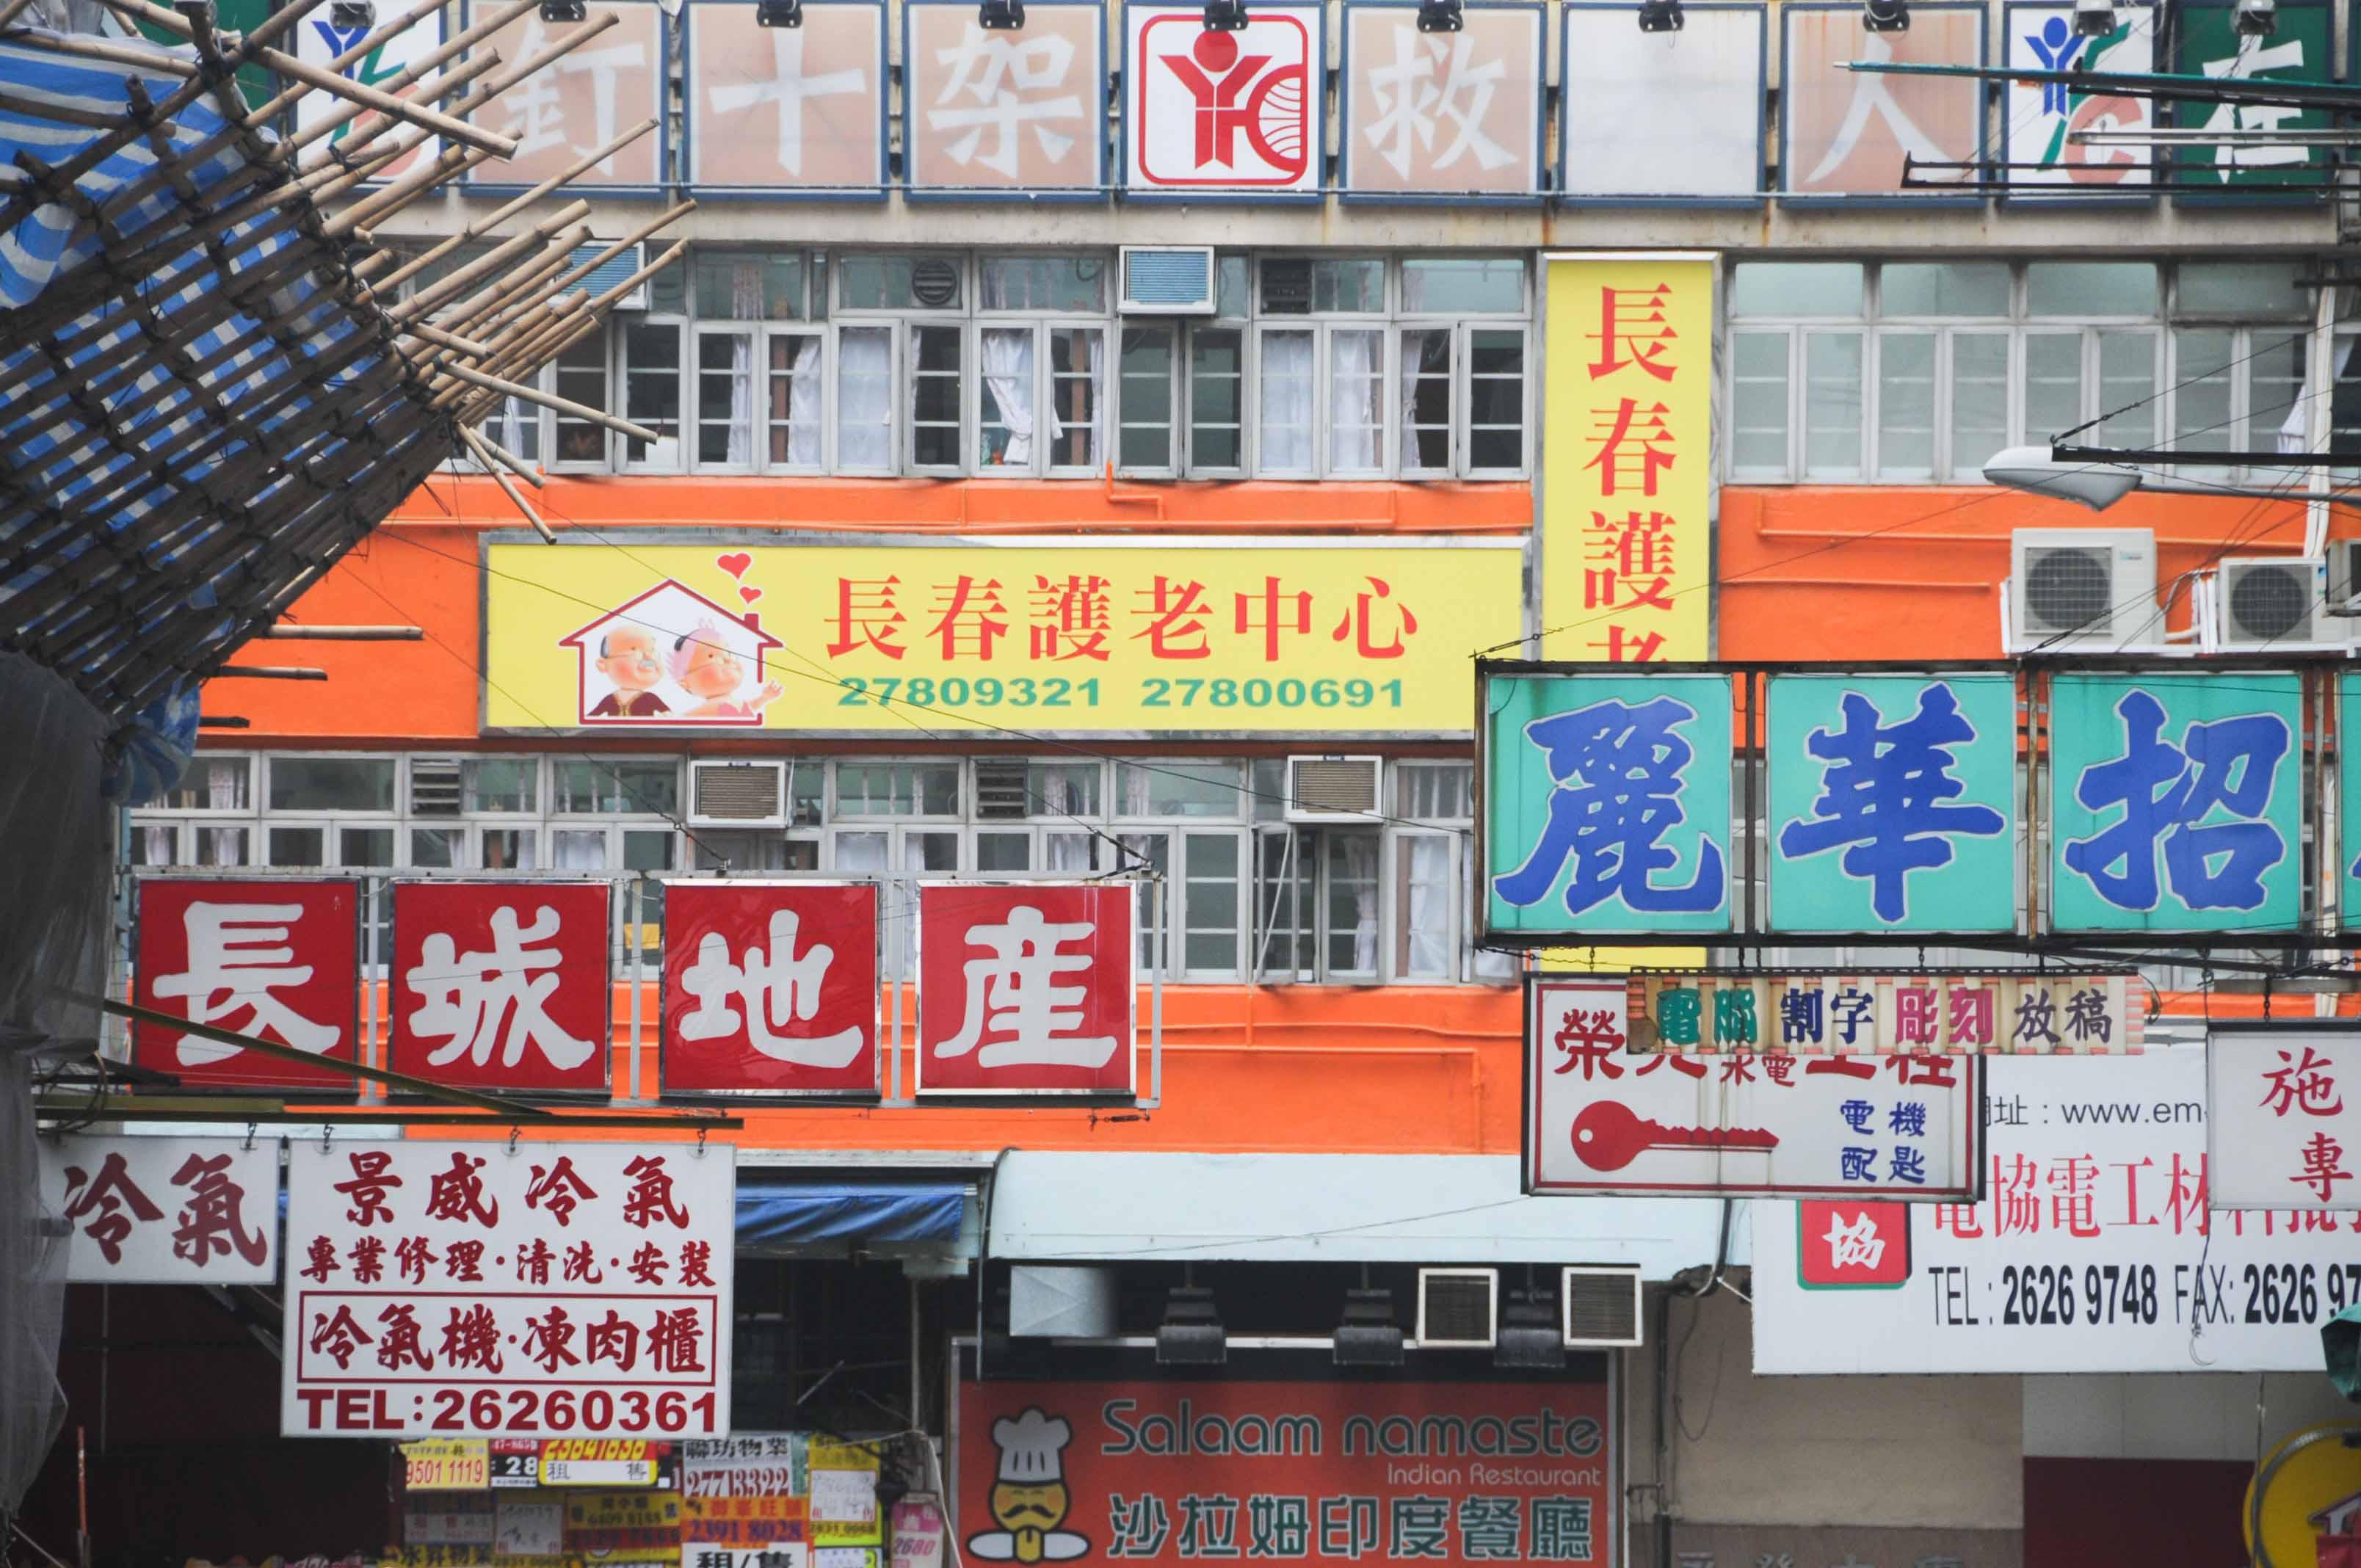 Une journée à Hong Kong...